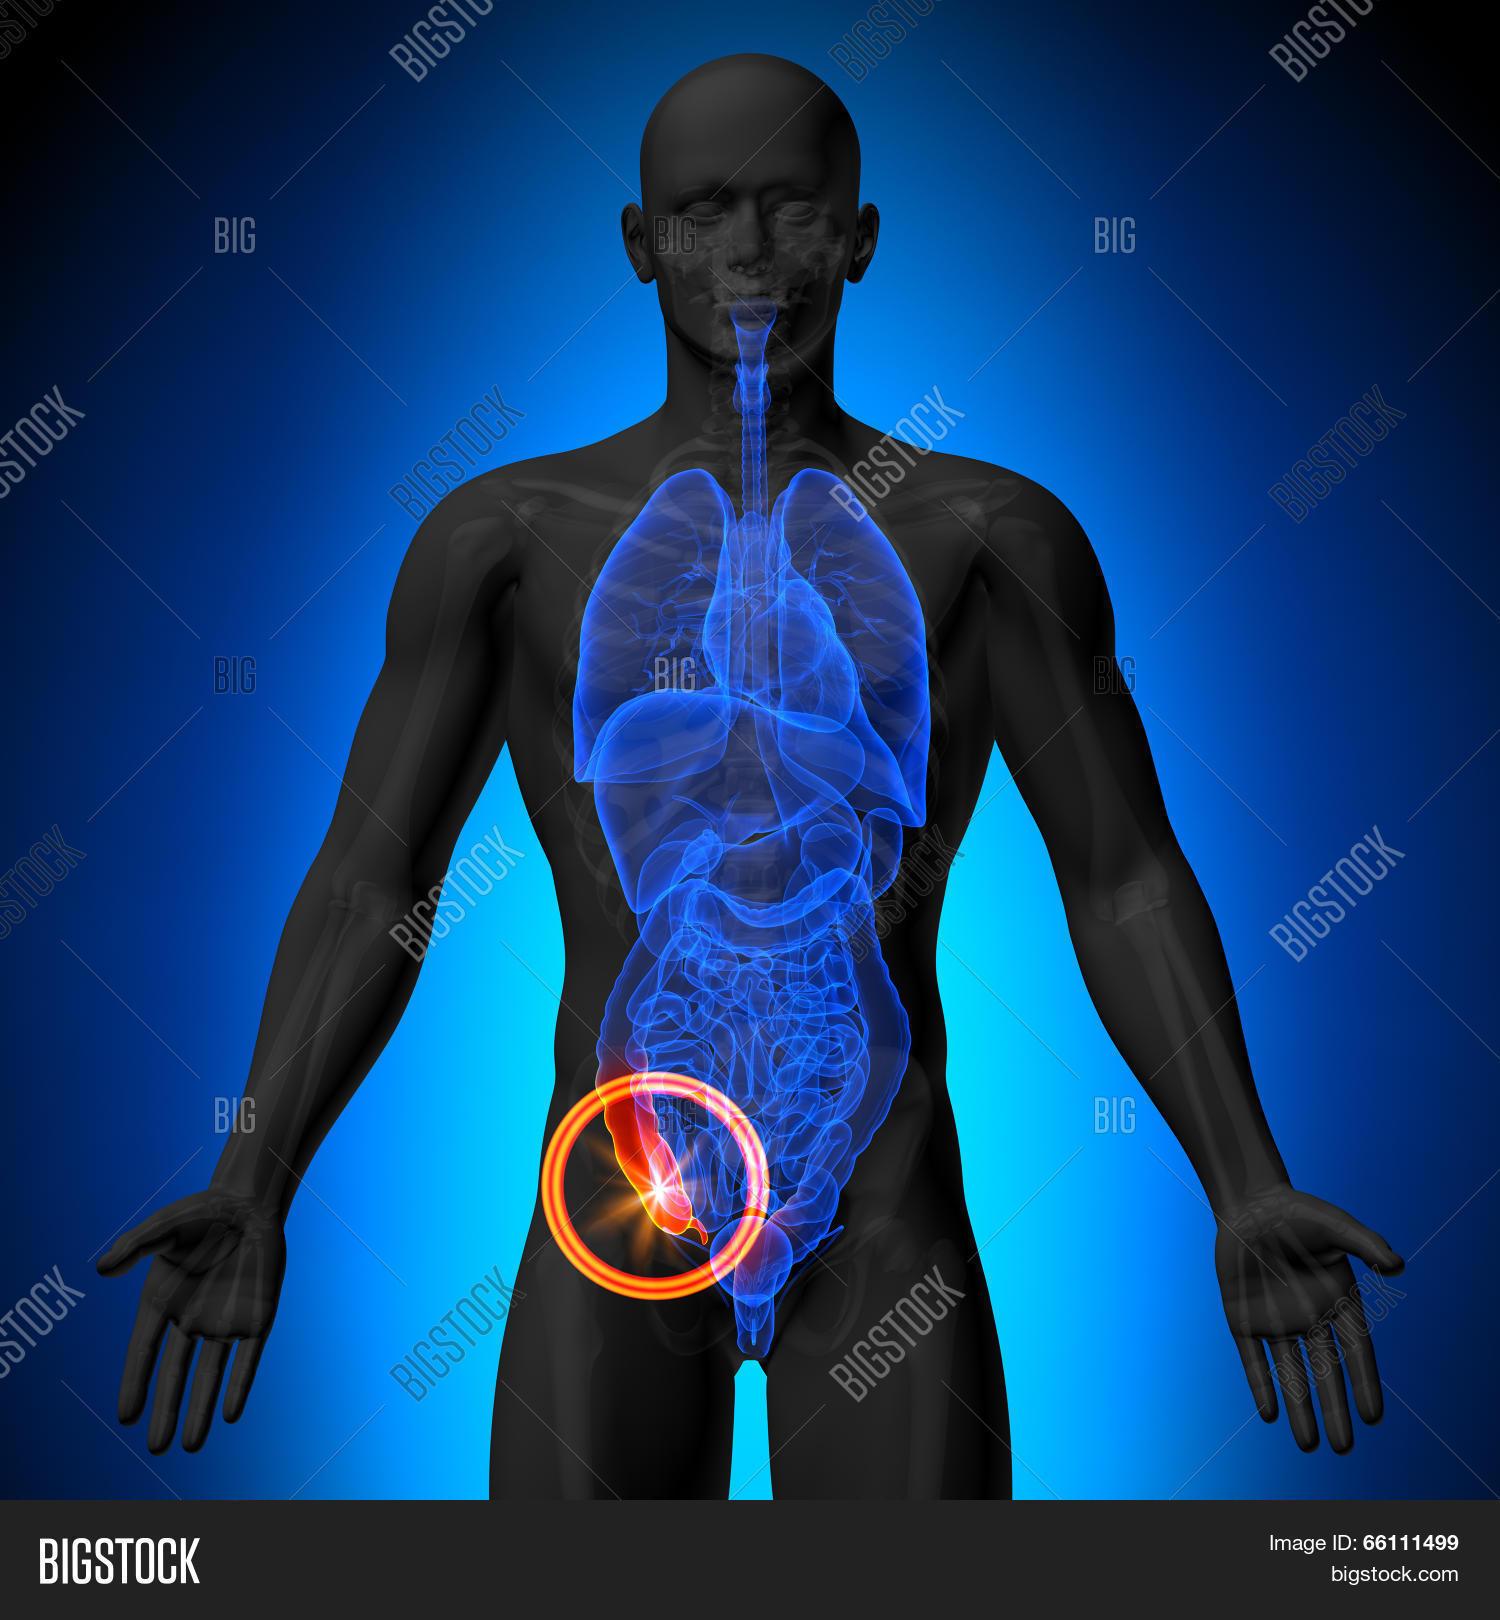 Appendix - Male Anatomy Human Image & Photo | Bigstock